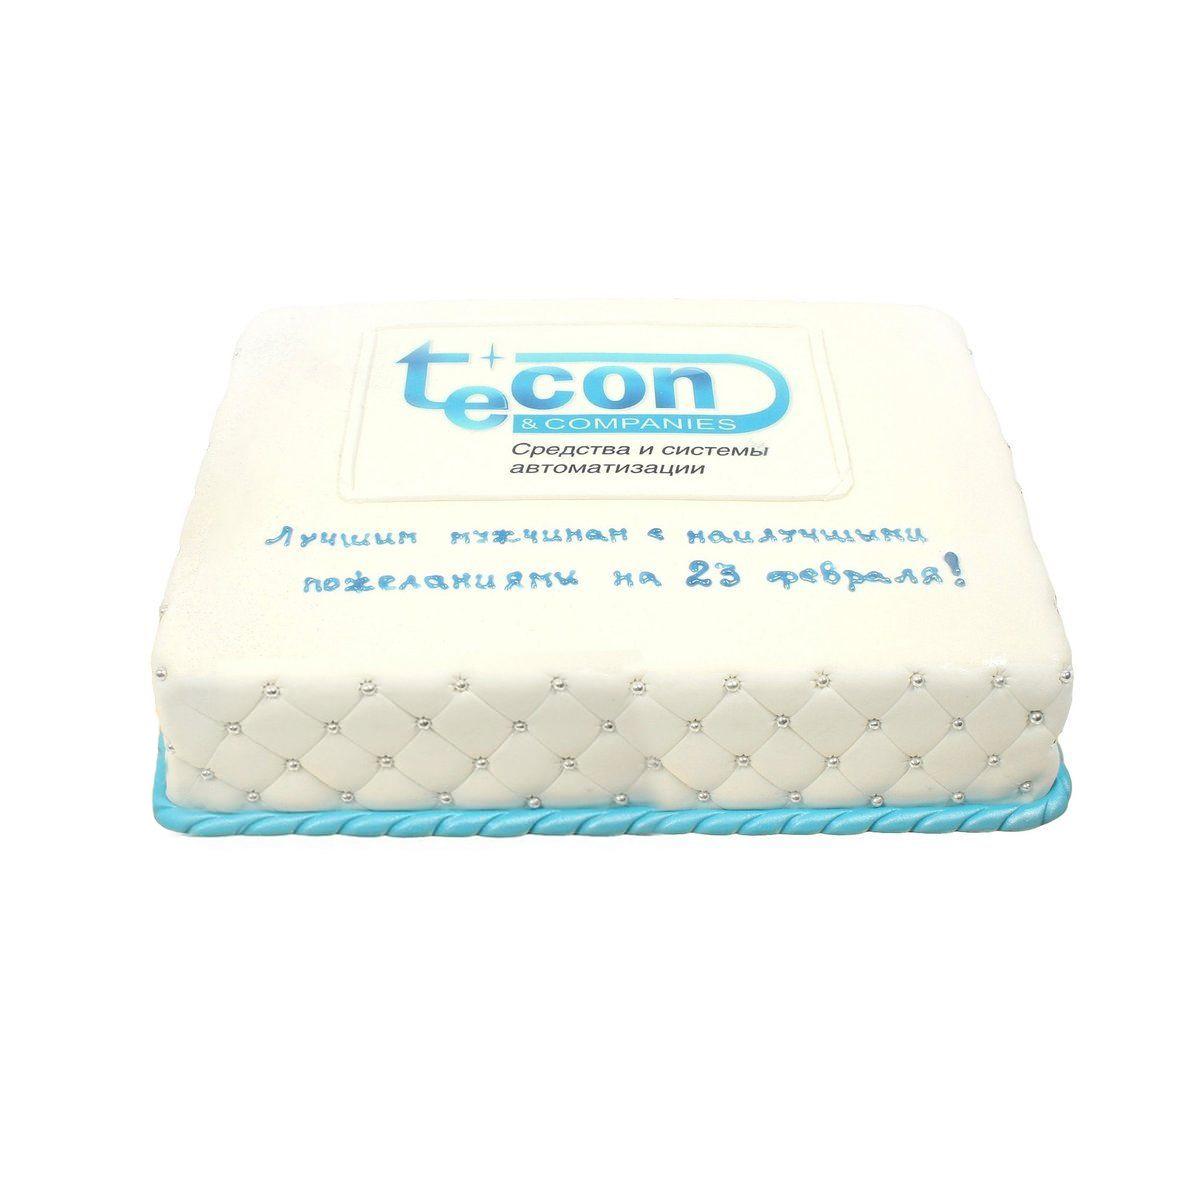 №422 Торт интернет